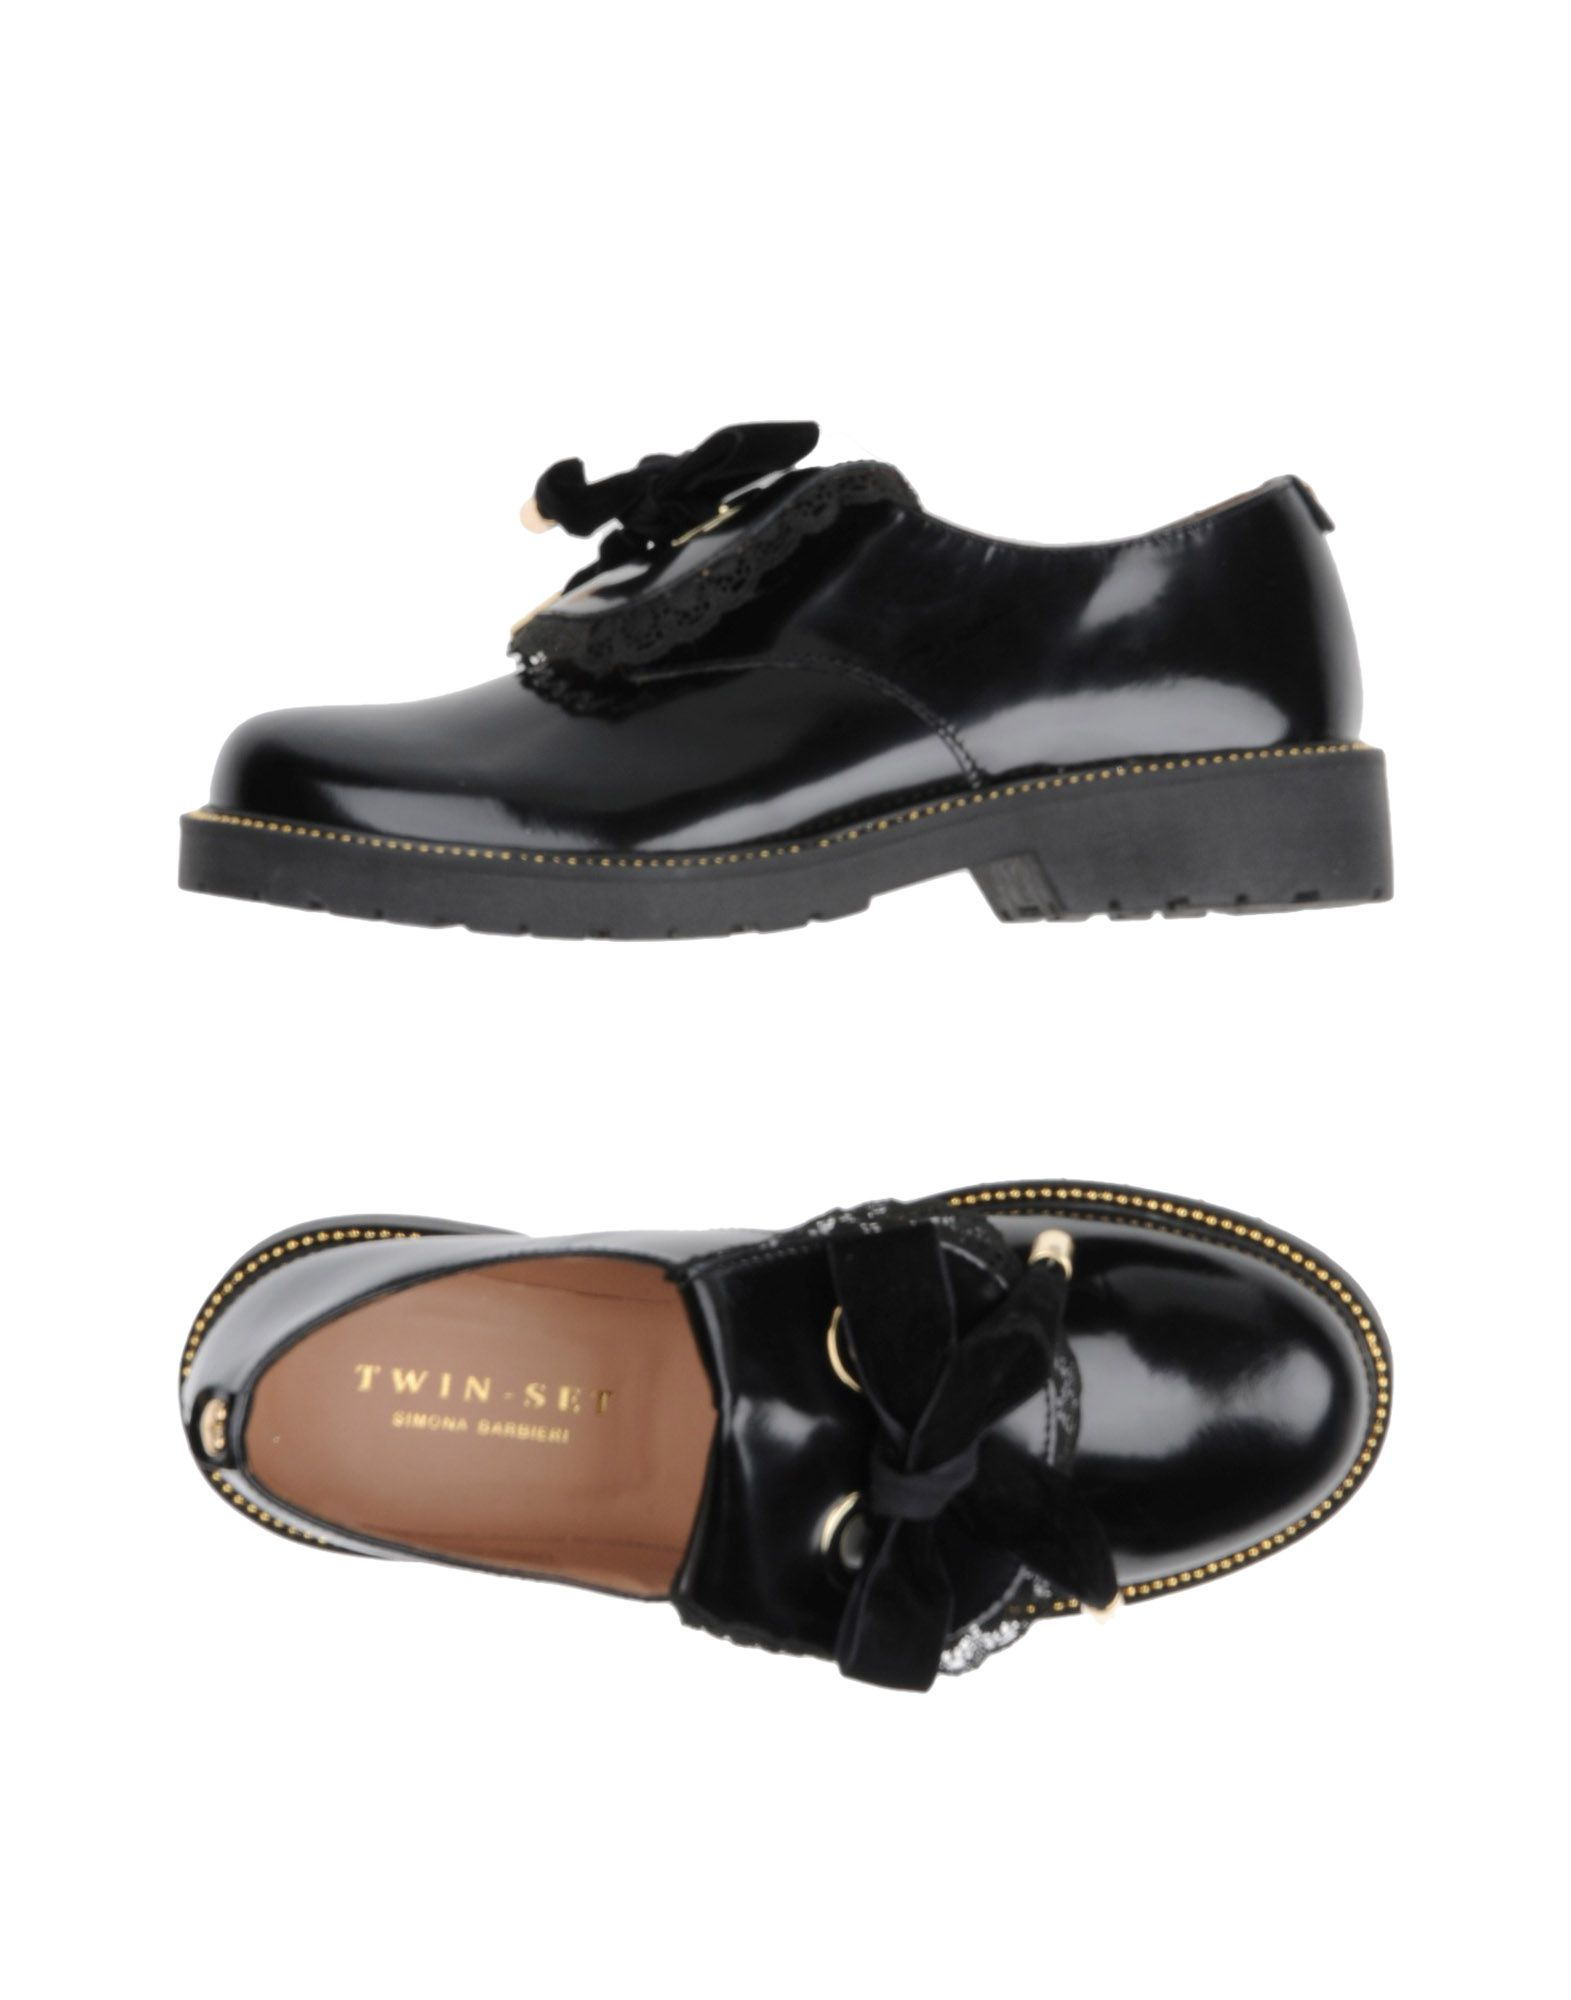 Haltbare Mode billige 11243766LV Schuhe Twin 11243766LV billige Beliebte Schuhe 629db5